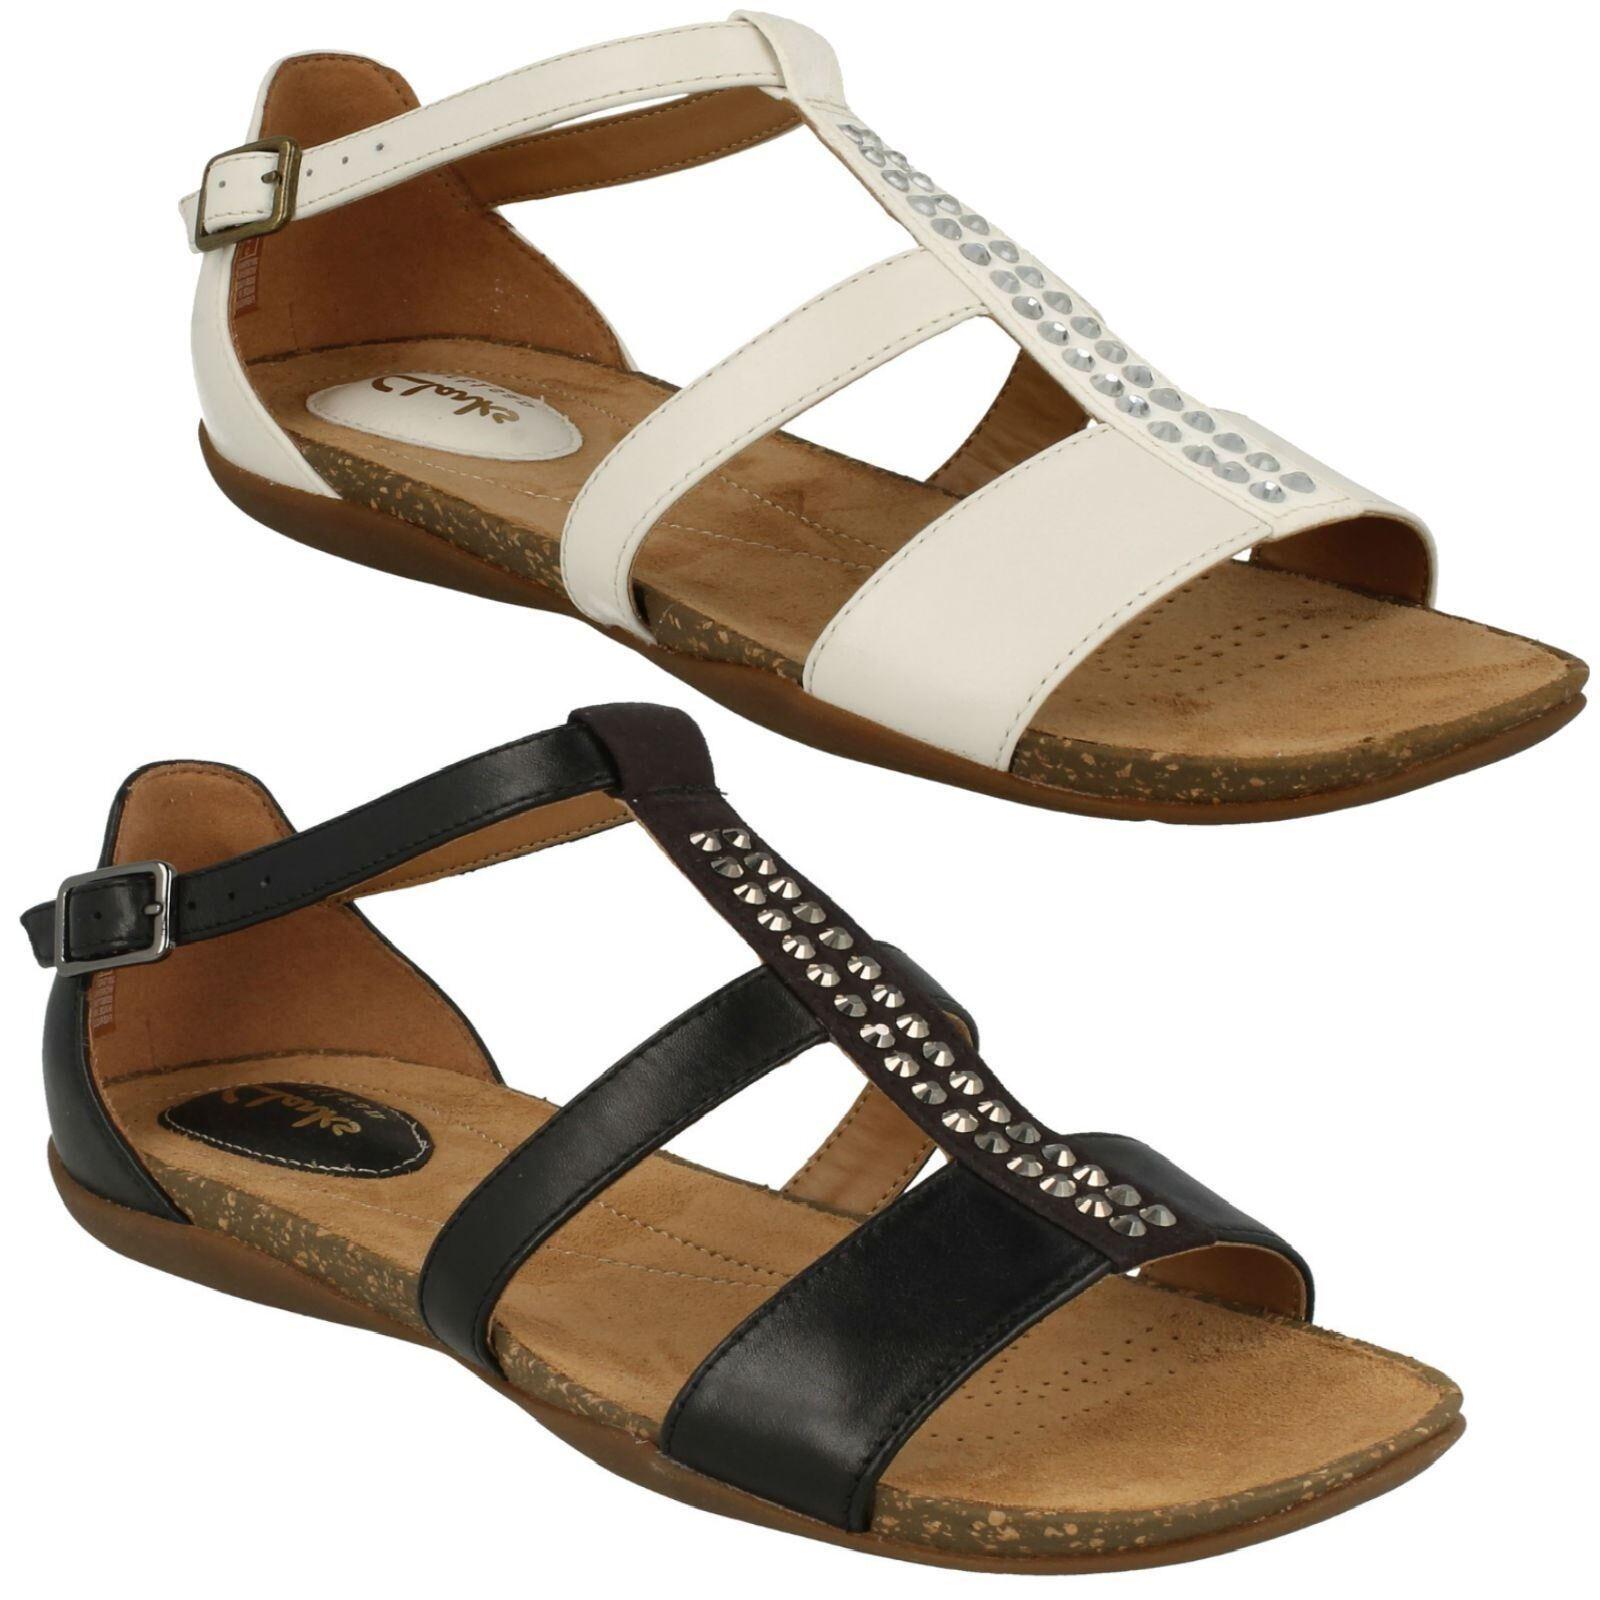 AUTUMN FRESH LADIES CLARKS LEATHER DIAMANTE DETAIL BUCKLE CASUAL SANDALS chaussures